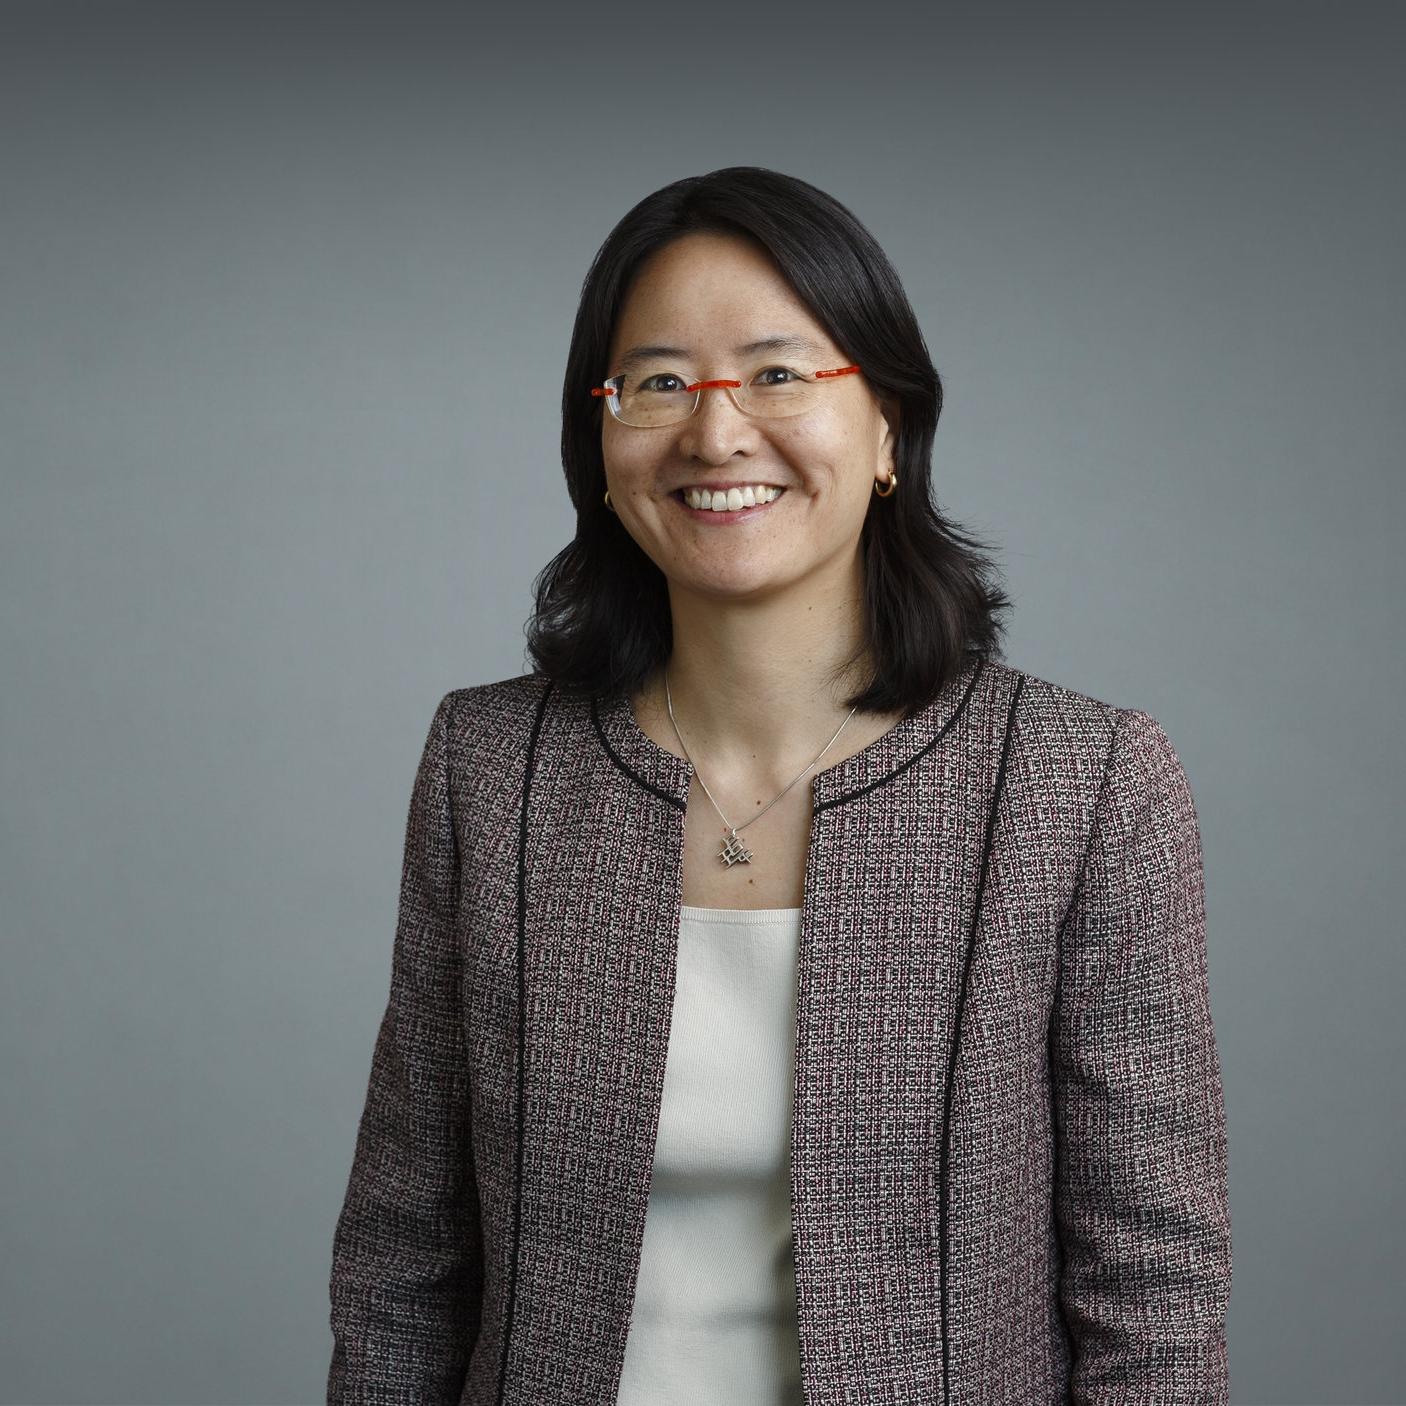 Yvonne W. Lui MD - Department of Radiology, NYU